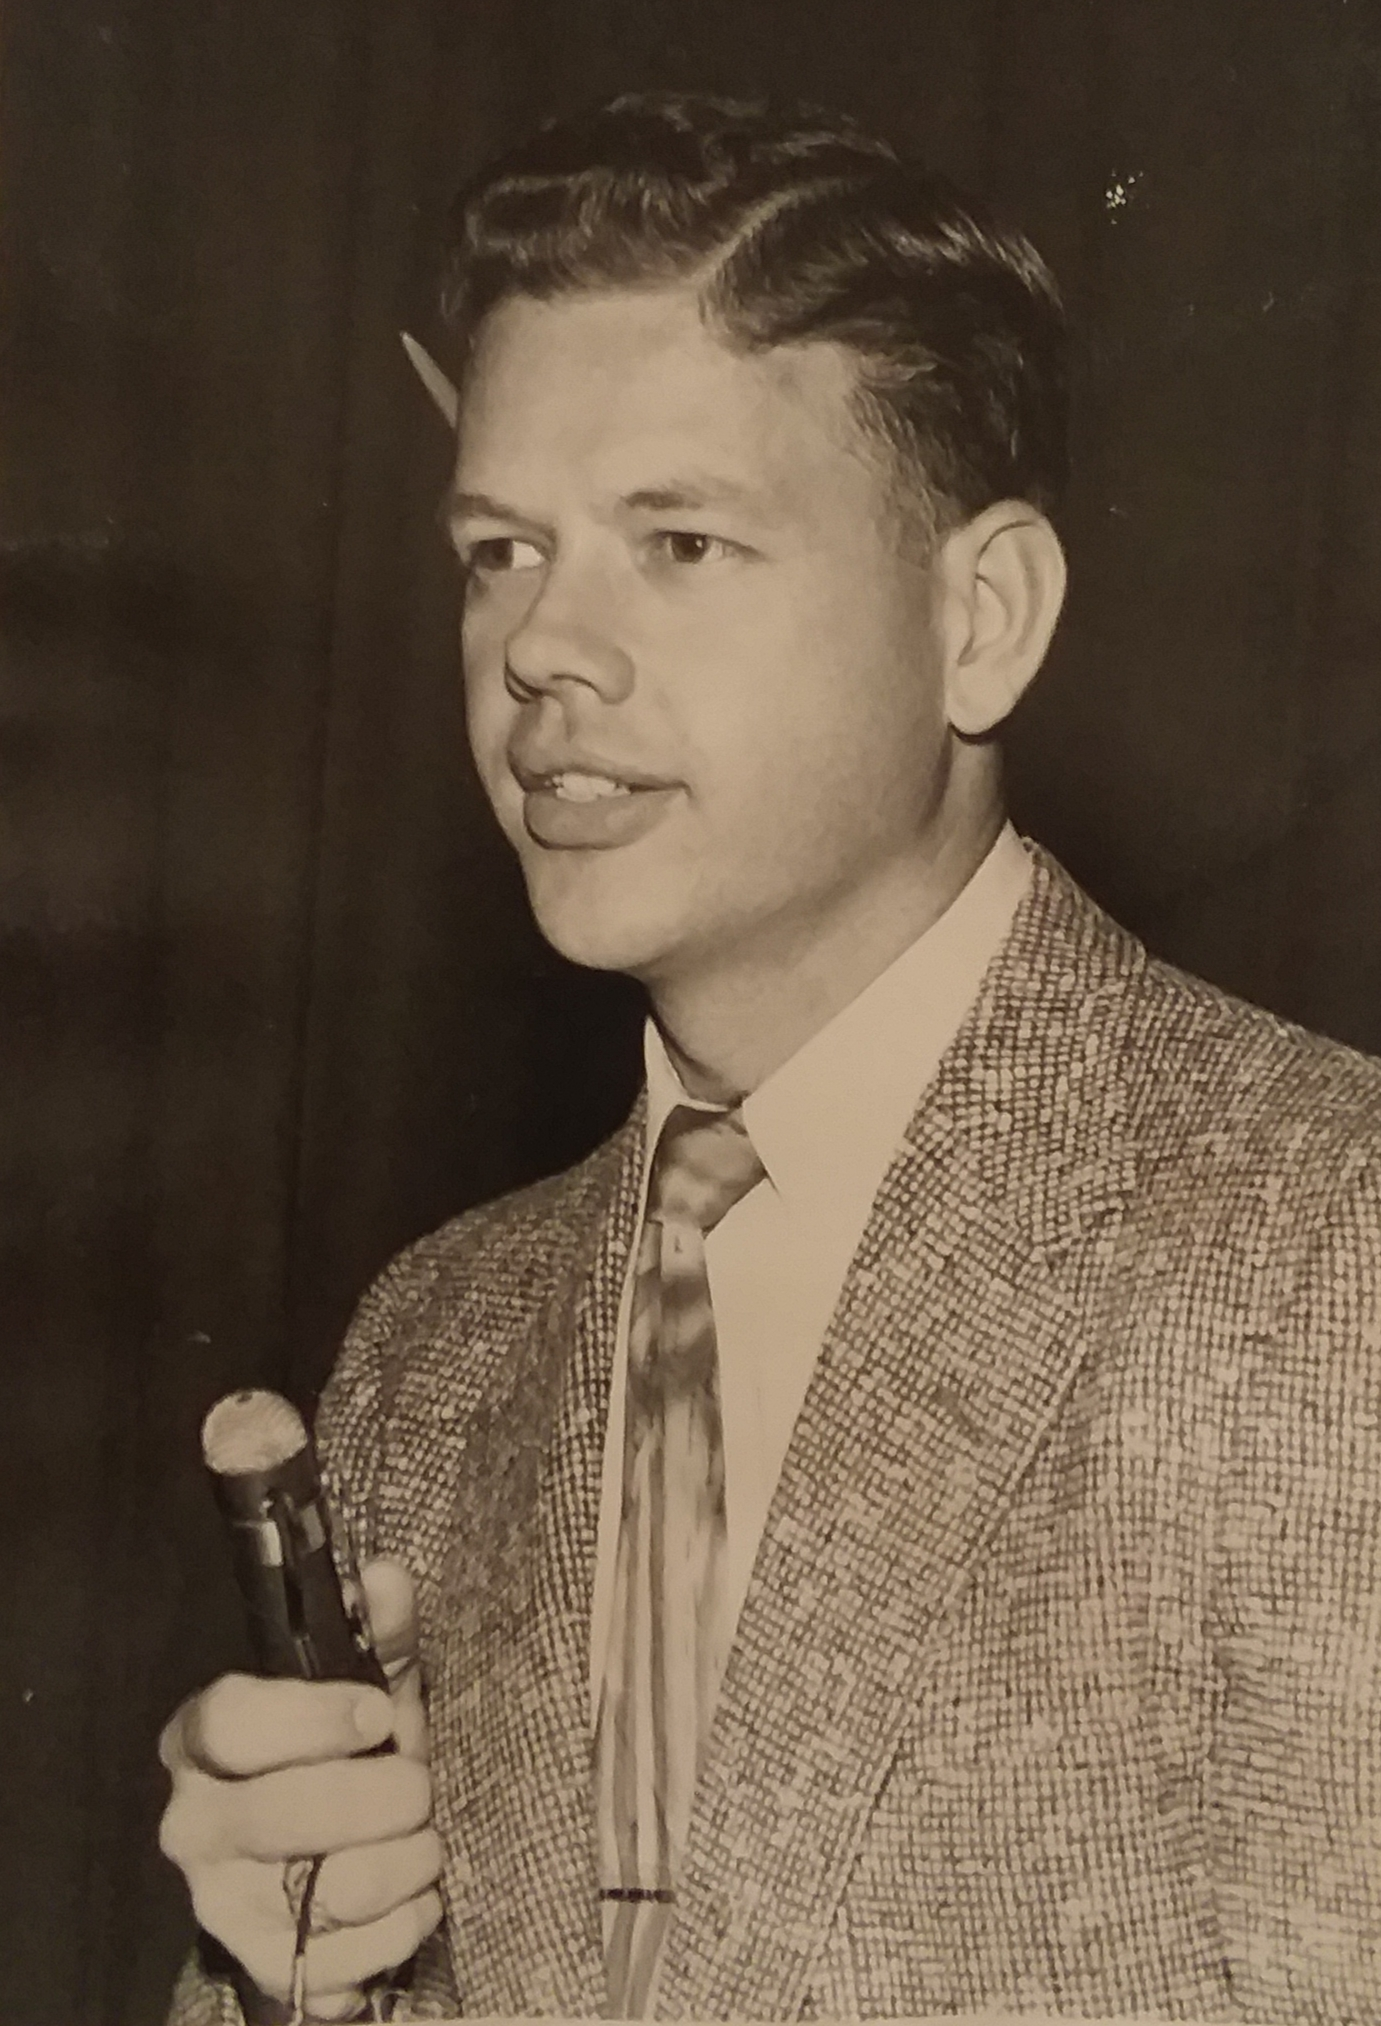 Donald George Tutt